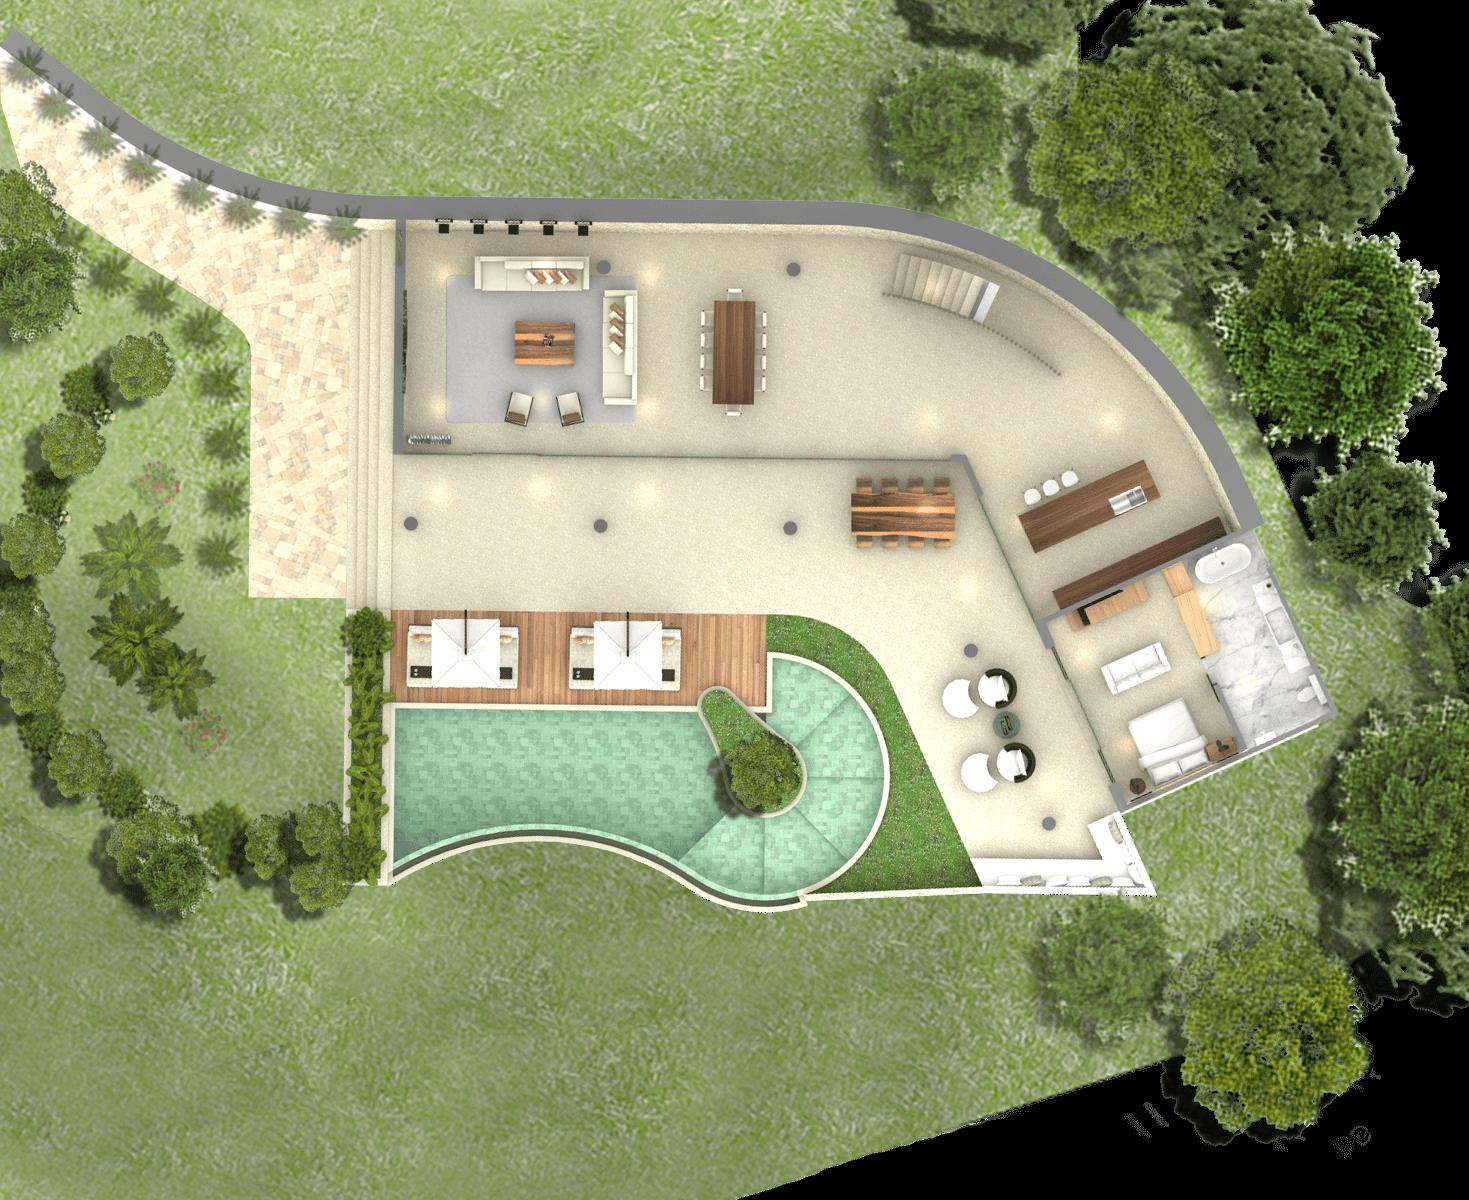 Pt. Indodesign Kreasi Mandiri Lombok Hotel South Lombok Kuta South Lombok Kuta Plan-Villa  16107